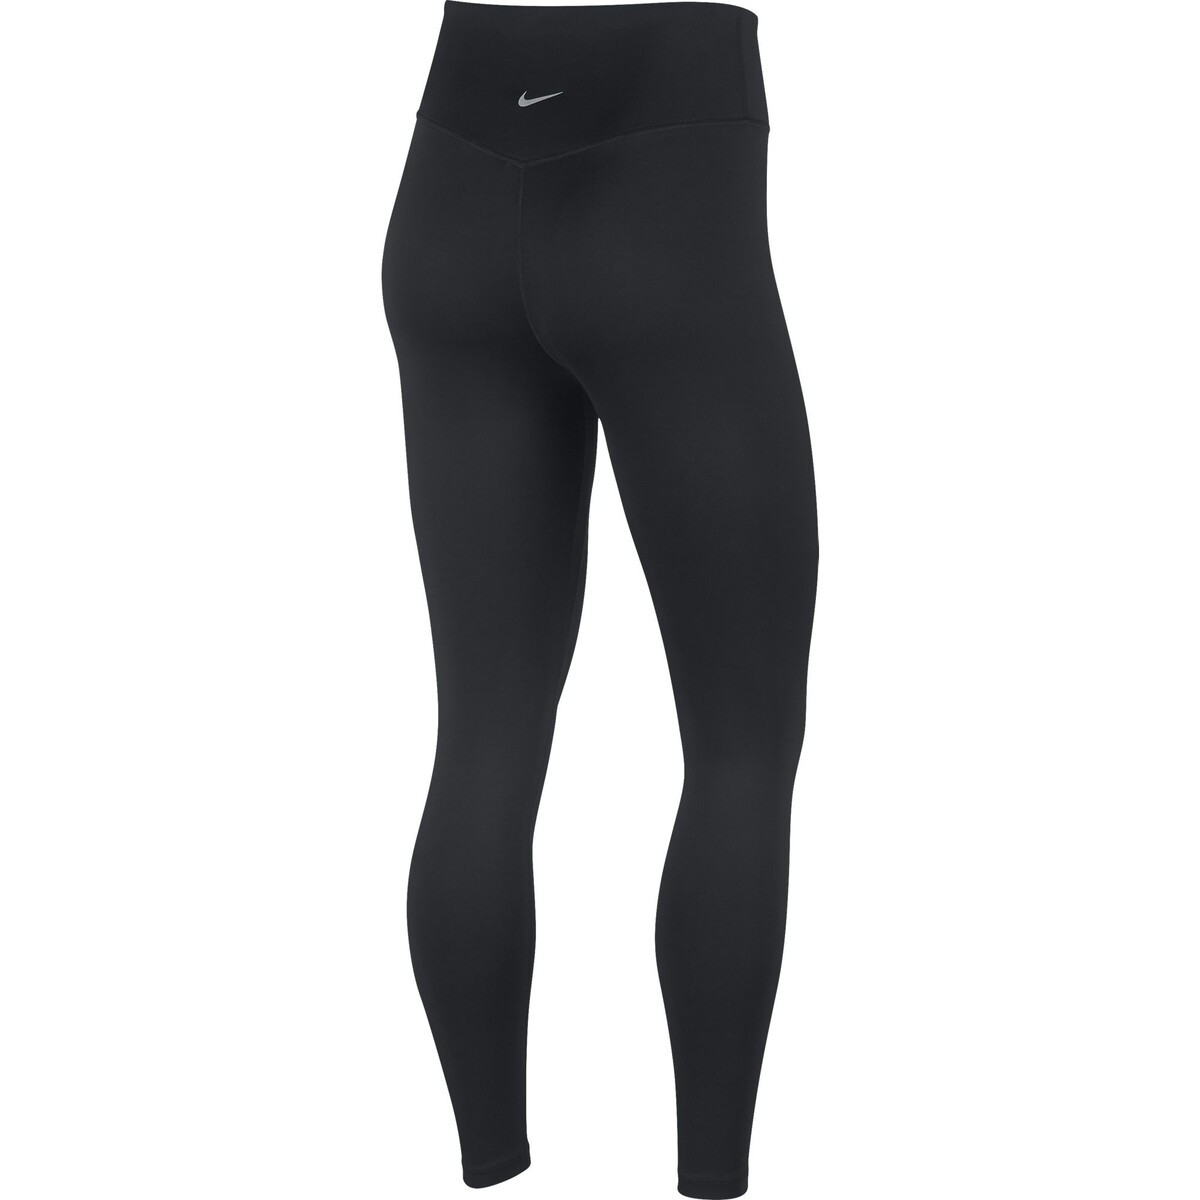 Calça Legging Nike Swoosh Run Tight Feminino Preto